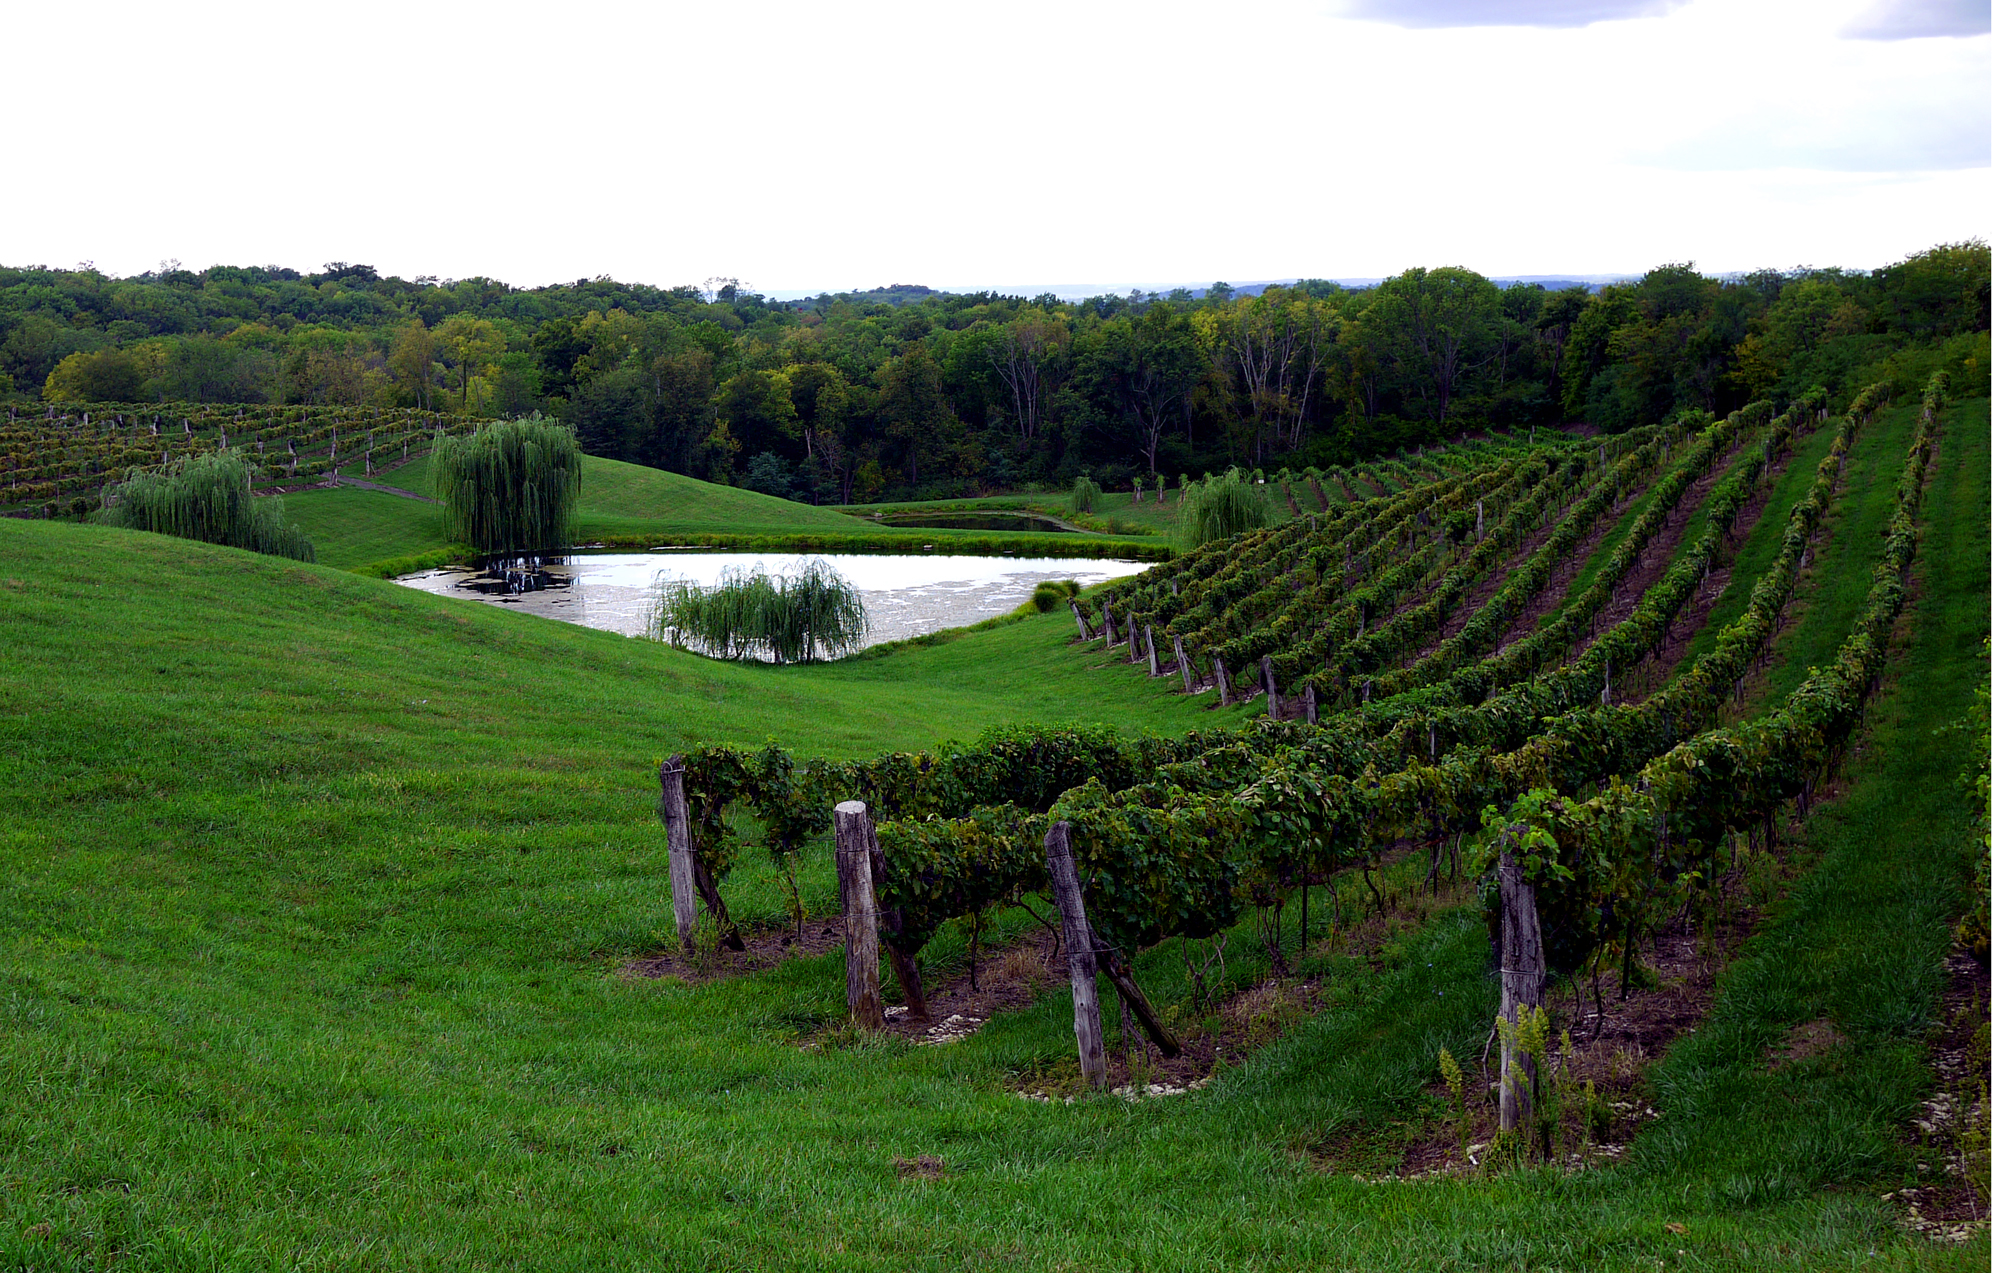 Ohio - Vineyards with Landot Noir Vines